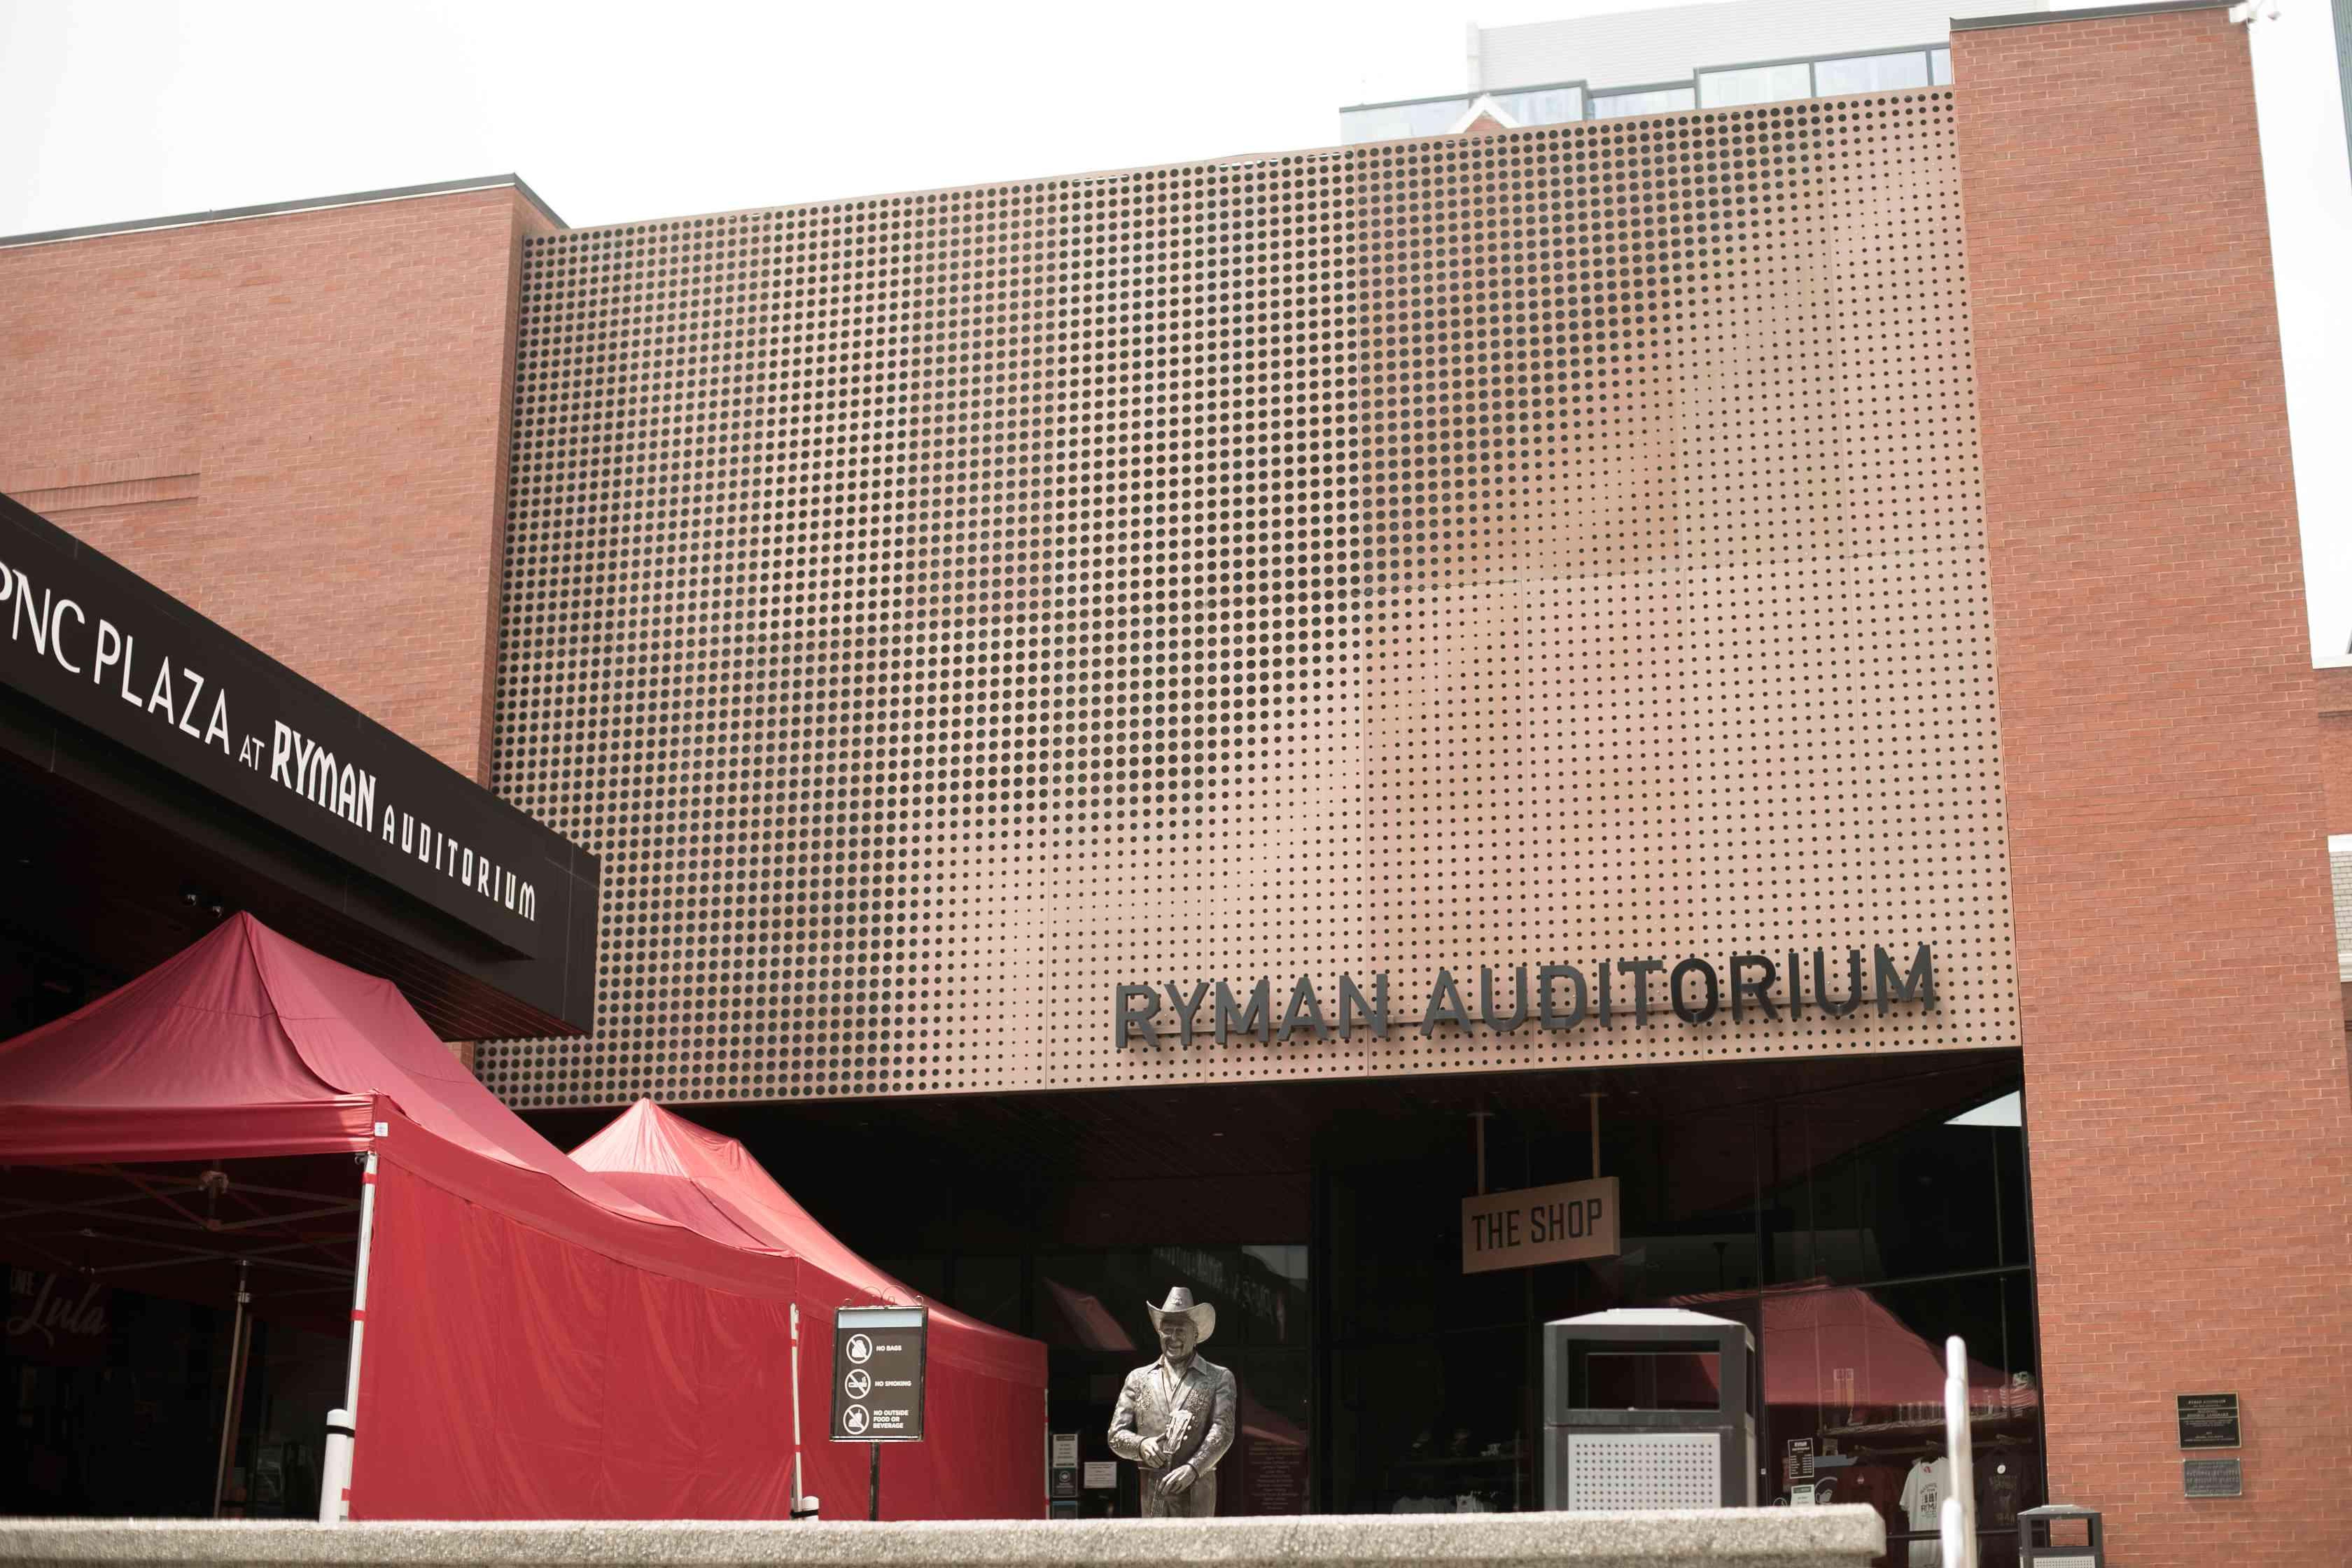 Nashville's Ryman Auditorium